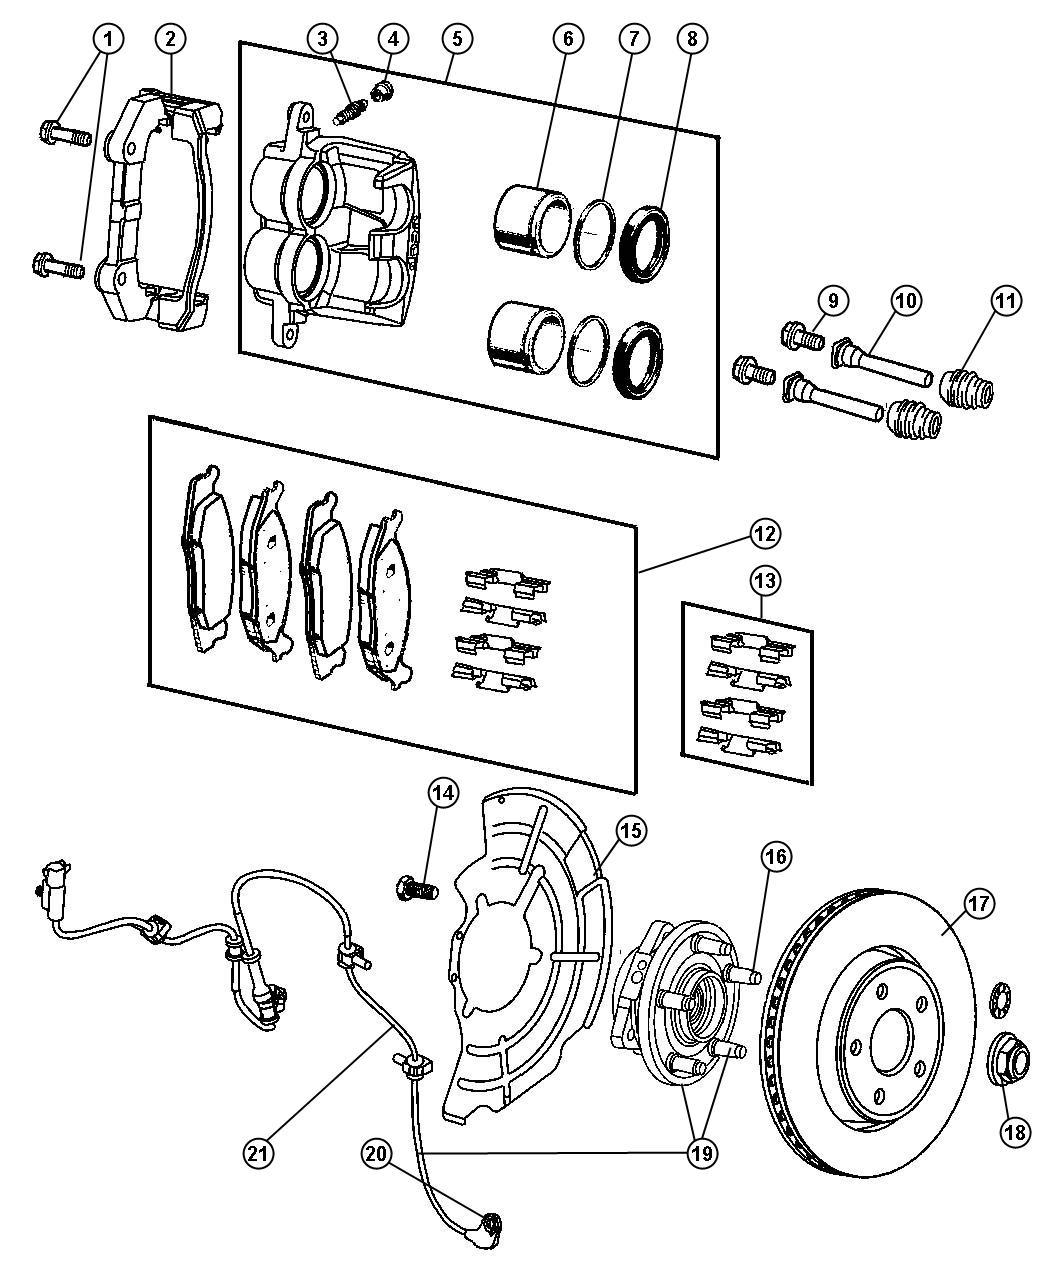 Jeep Grand Cherokee Used For Hub And Bearing Brake